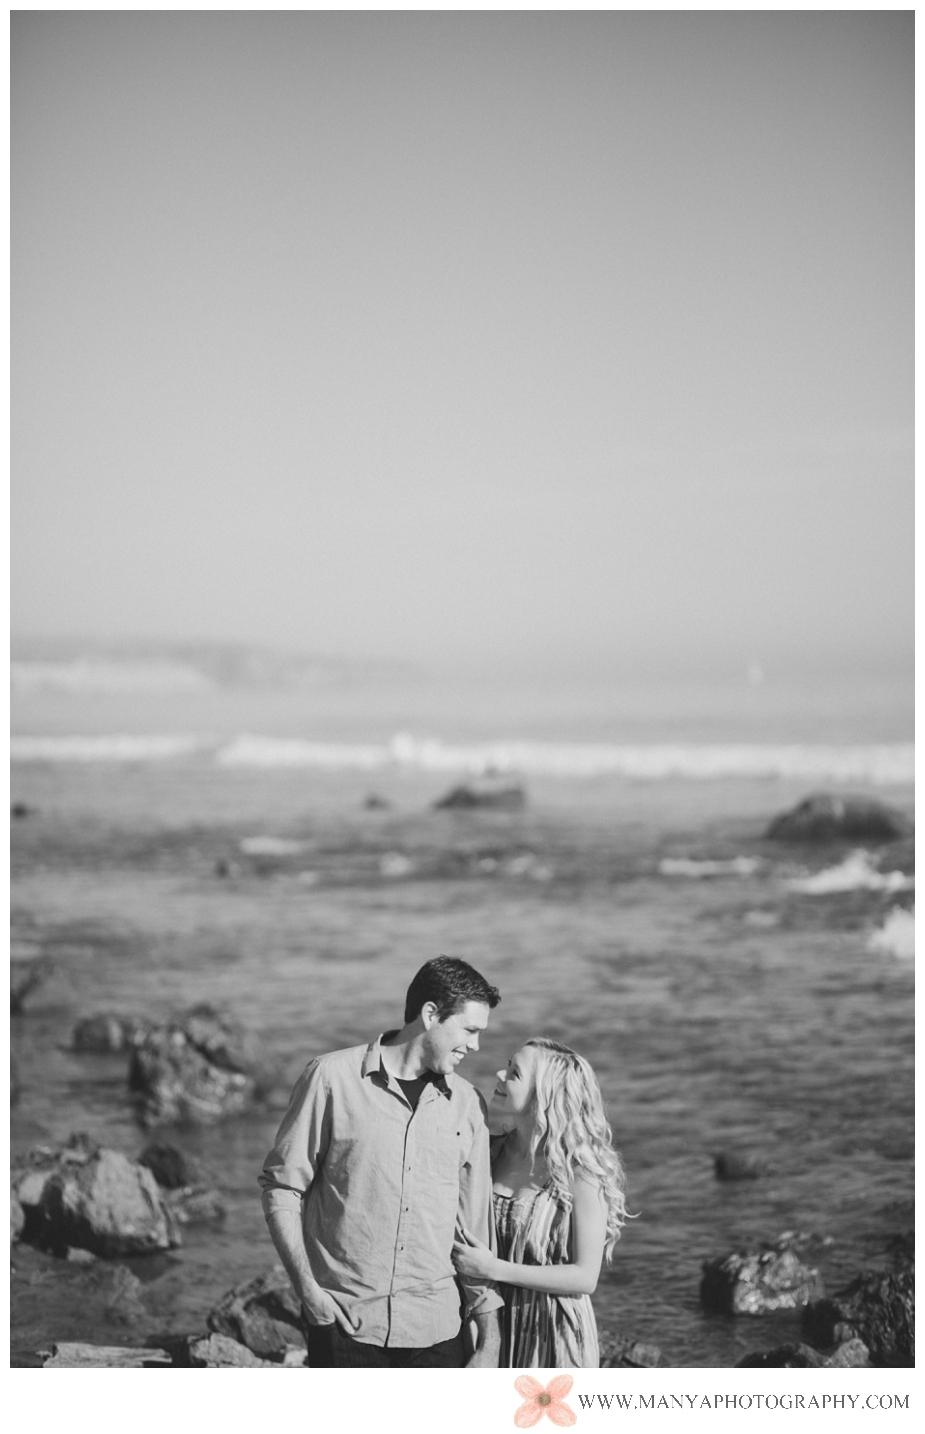 2013-07-11_0010 - Orange County Wedding Photographer